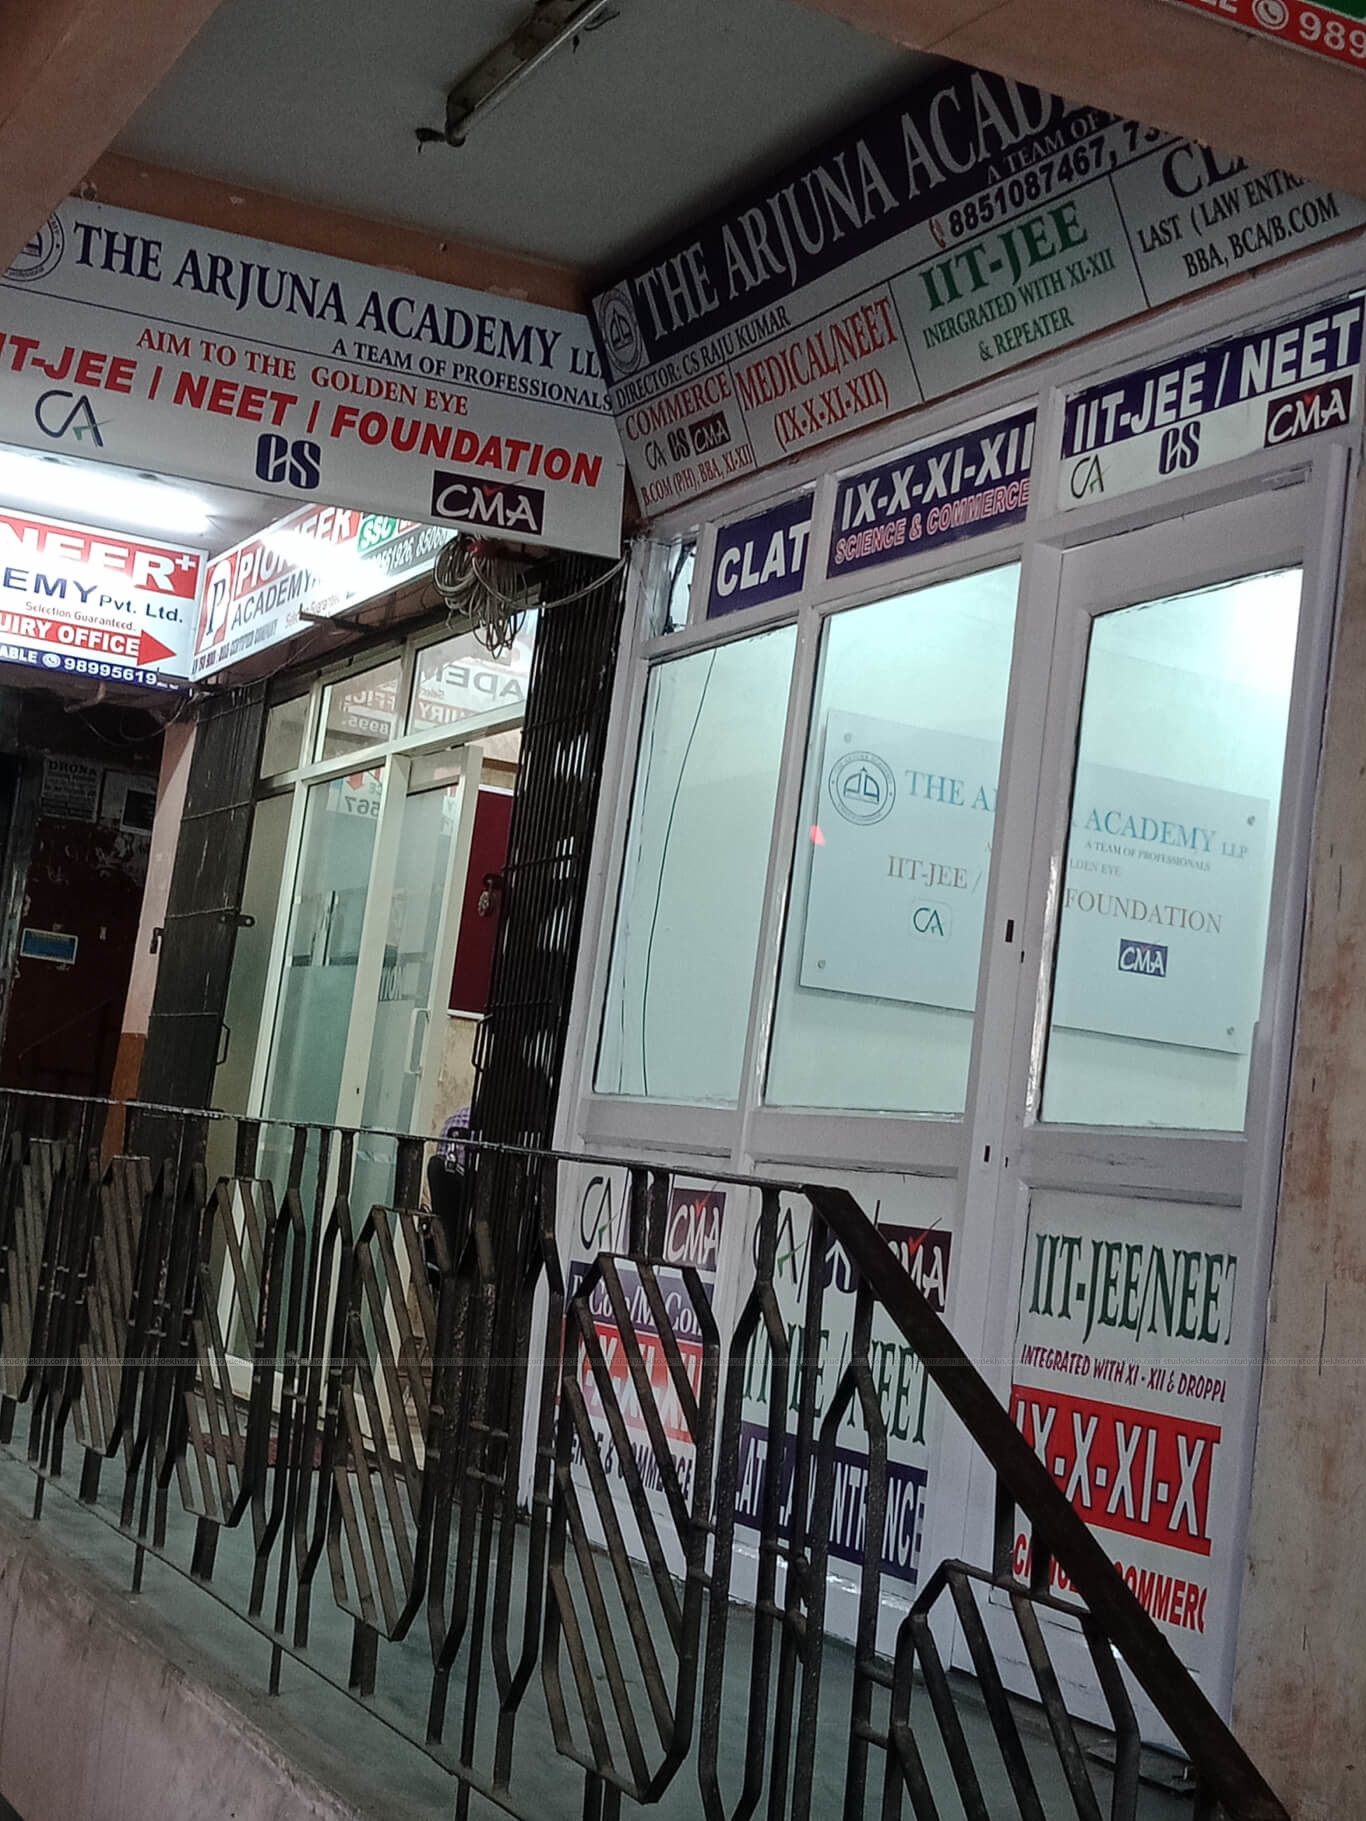 THE ARJUNA ACADEMY Gallery